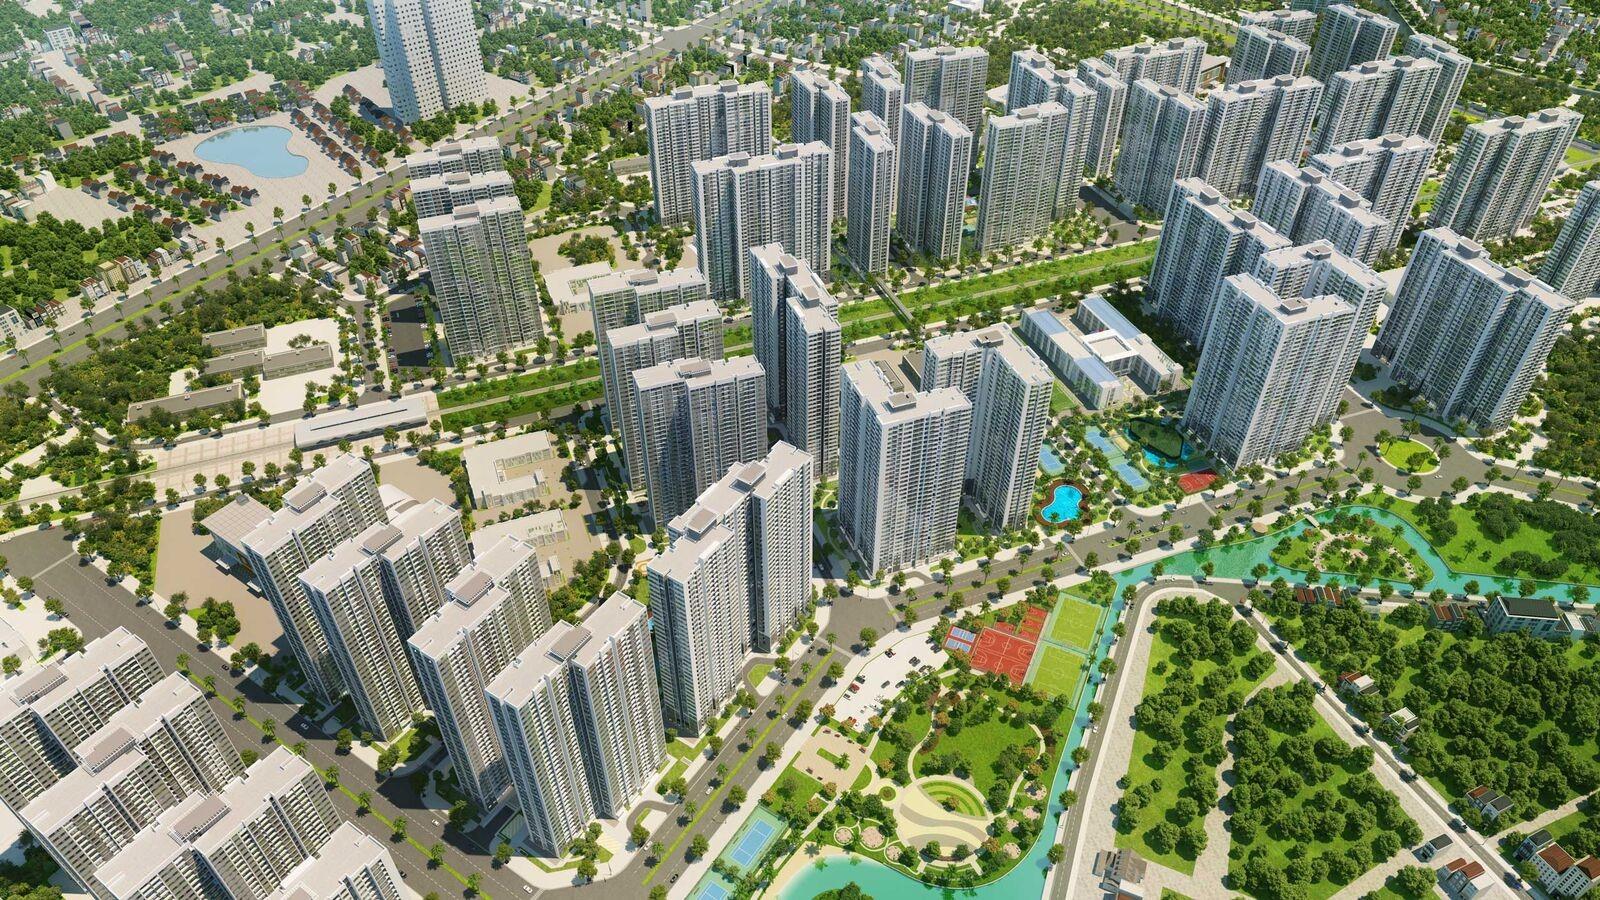 Vinhomes-smart-city-ung-dung-cong-nghe-giup-nguoi-viet-lan-dau-trai-nghiem-chuan-song-quoc-te-2